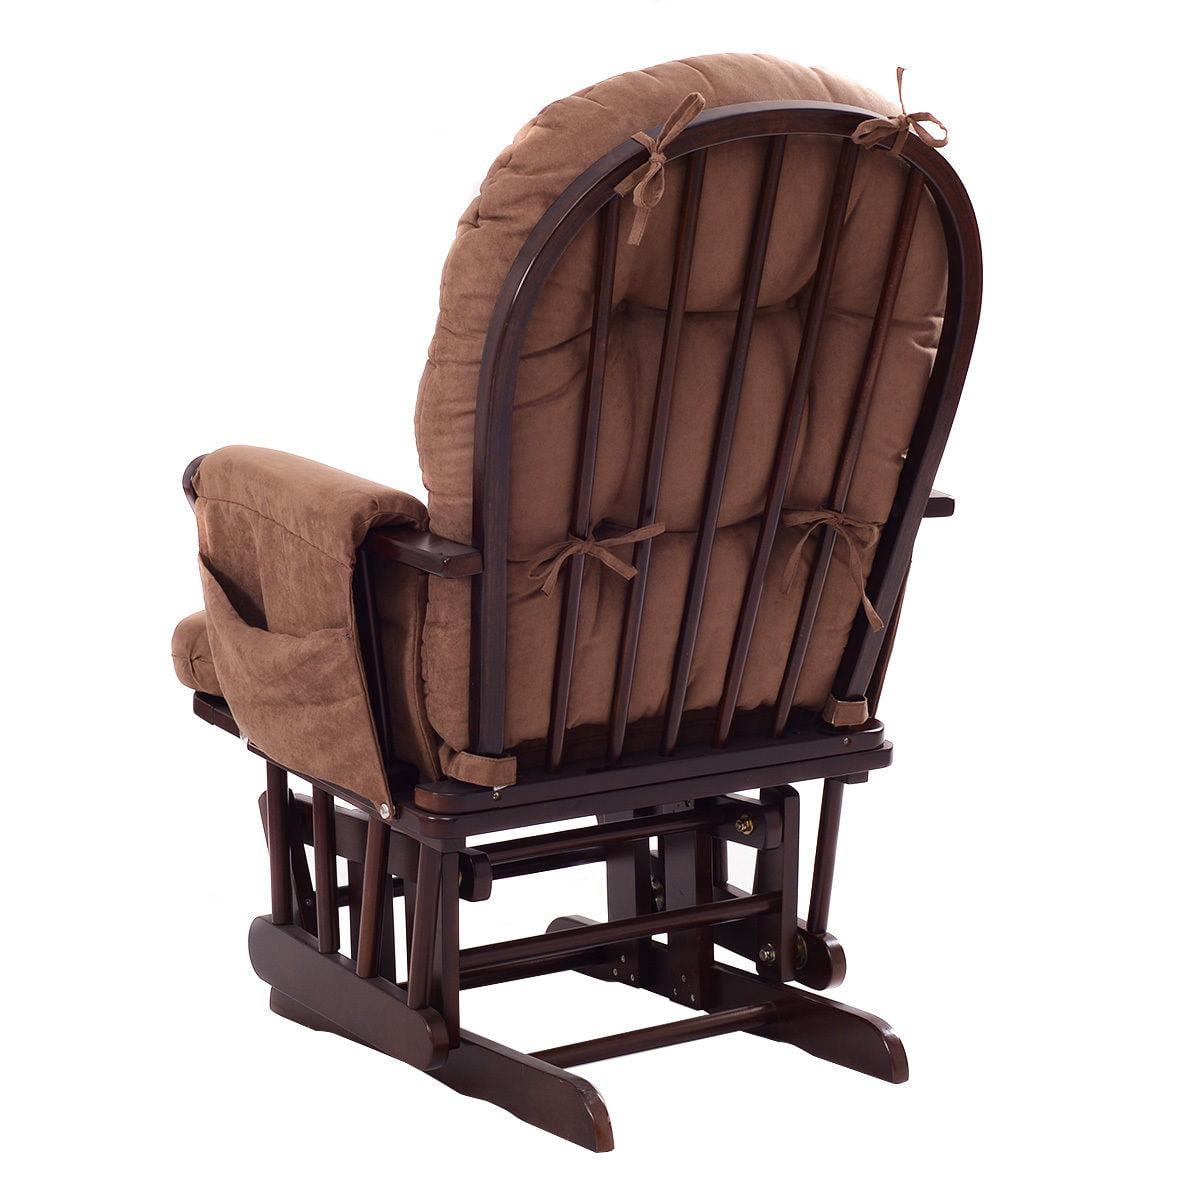 Baby Nursery Relax Rocking Chair Hoop Glider Amp Ottoman Set